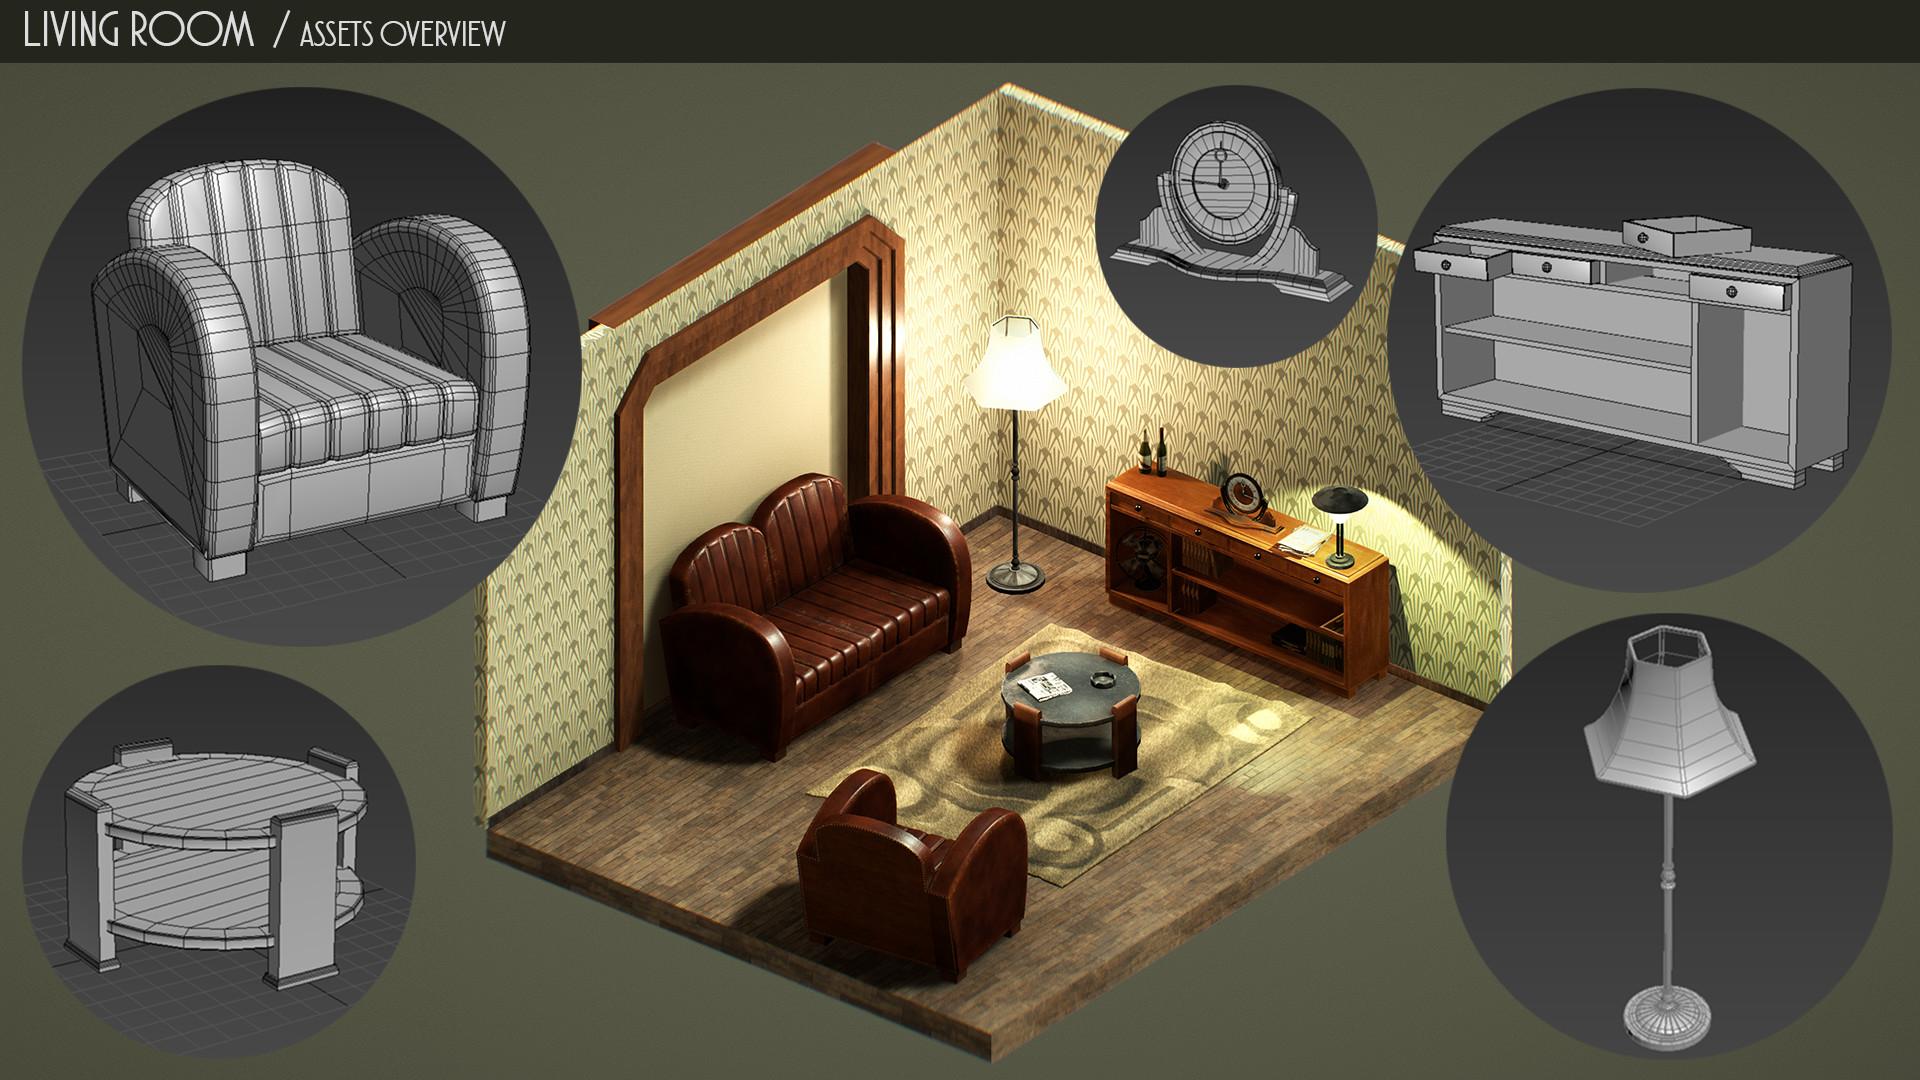 Augustin grassien livingroom assetsoverview